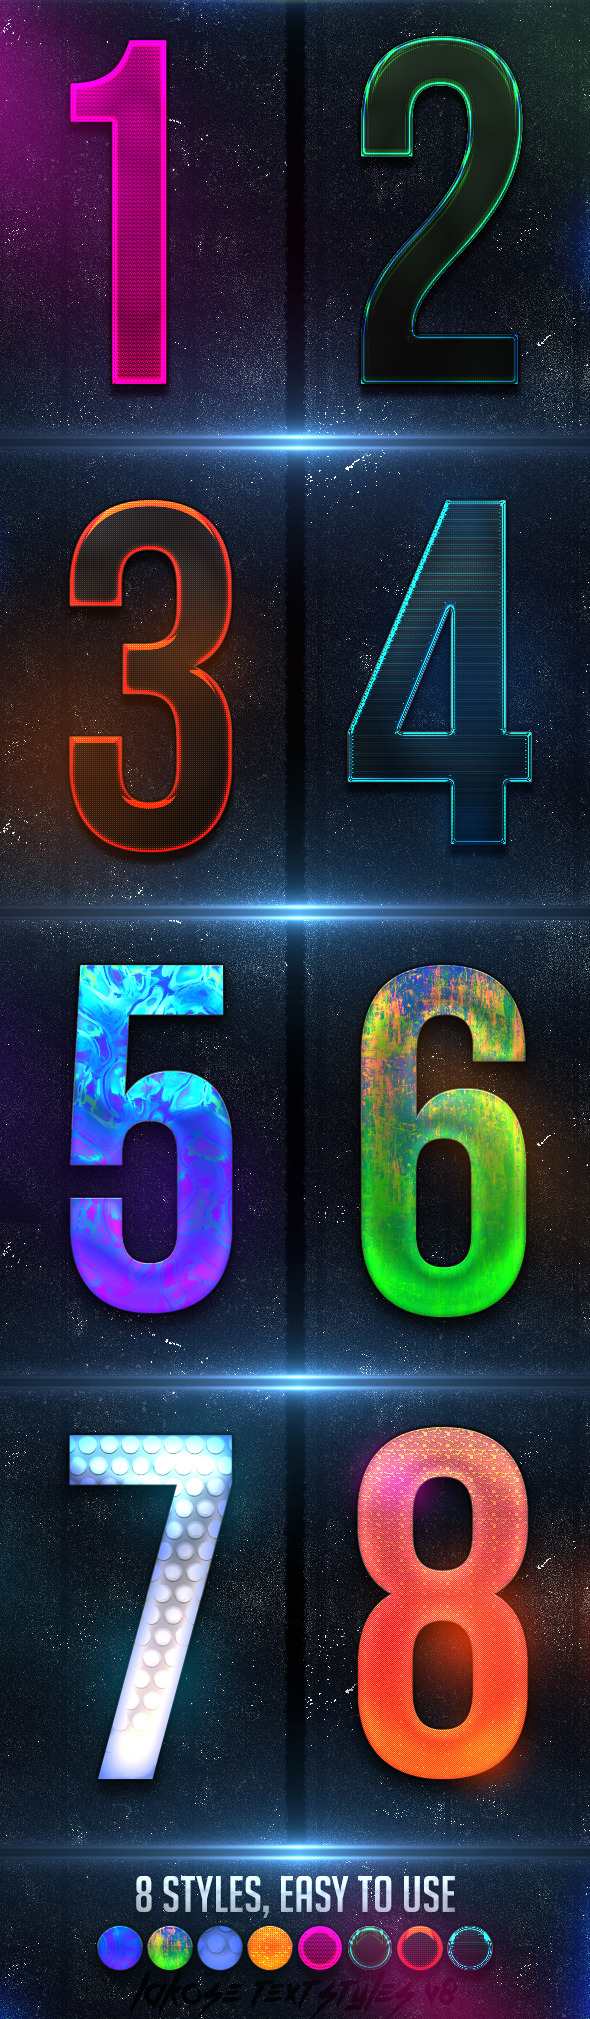 GraphicRiver Lakose Text Styles V8 9331289